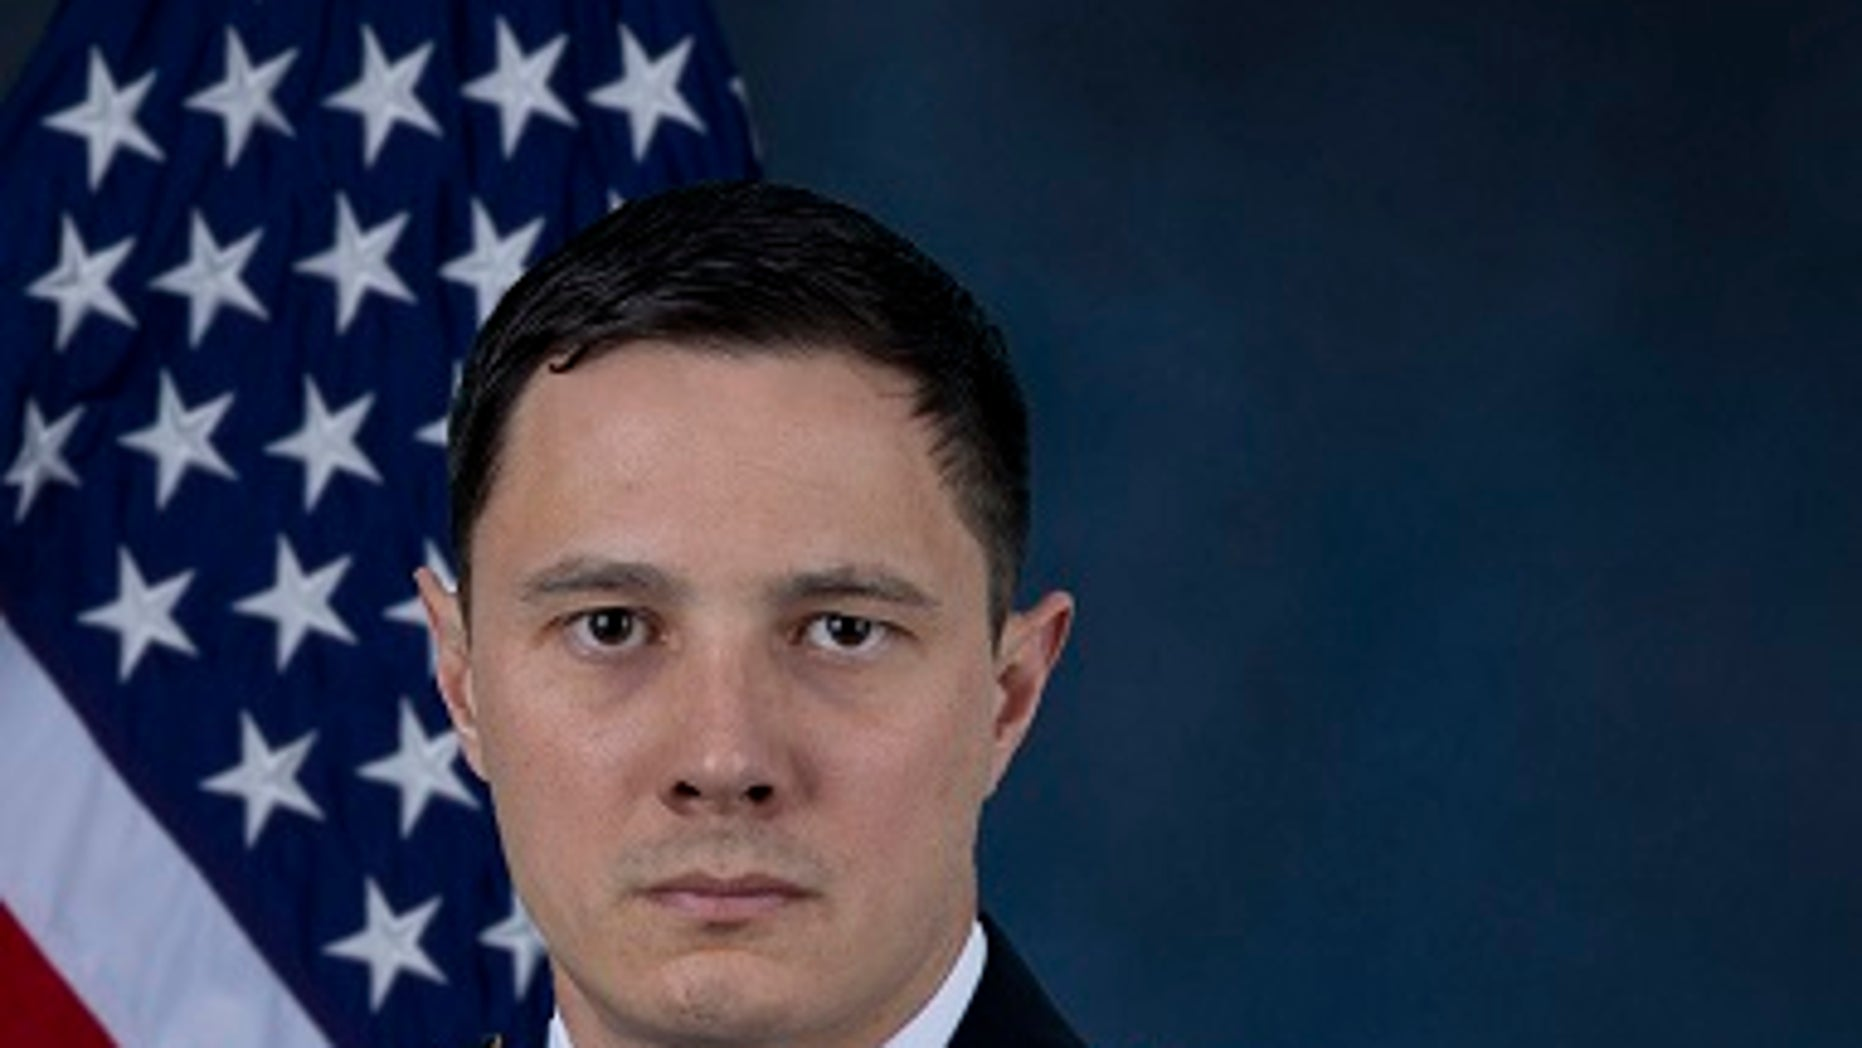 Master Sgt. Johnathan J. Dunbar died of his injuries, the DOD said.